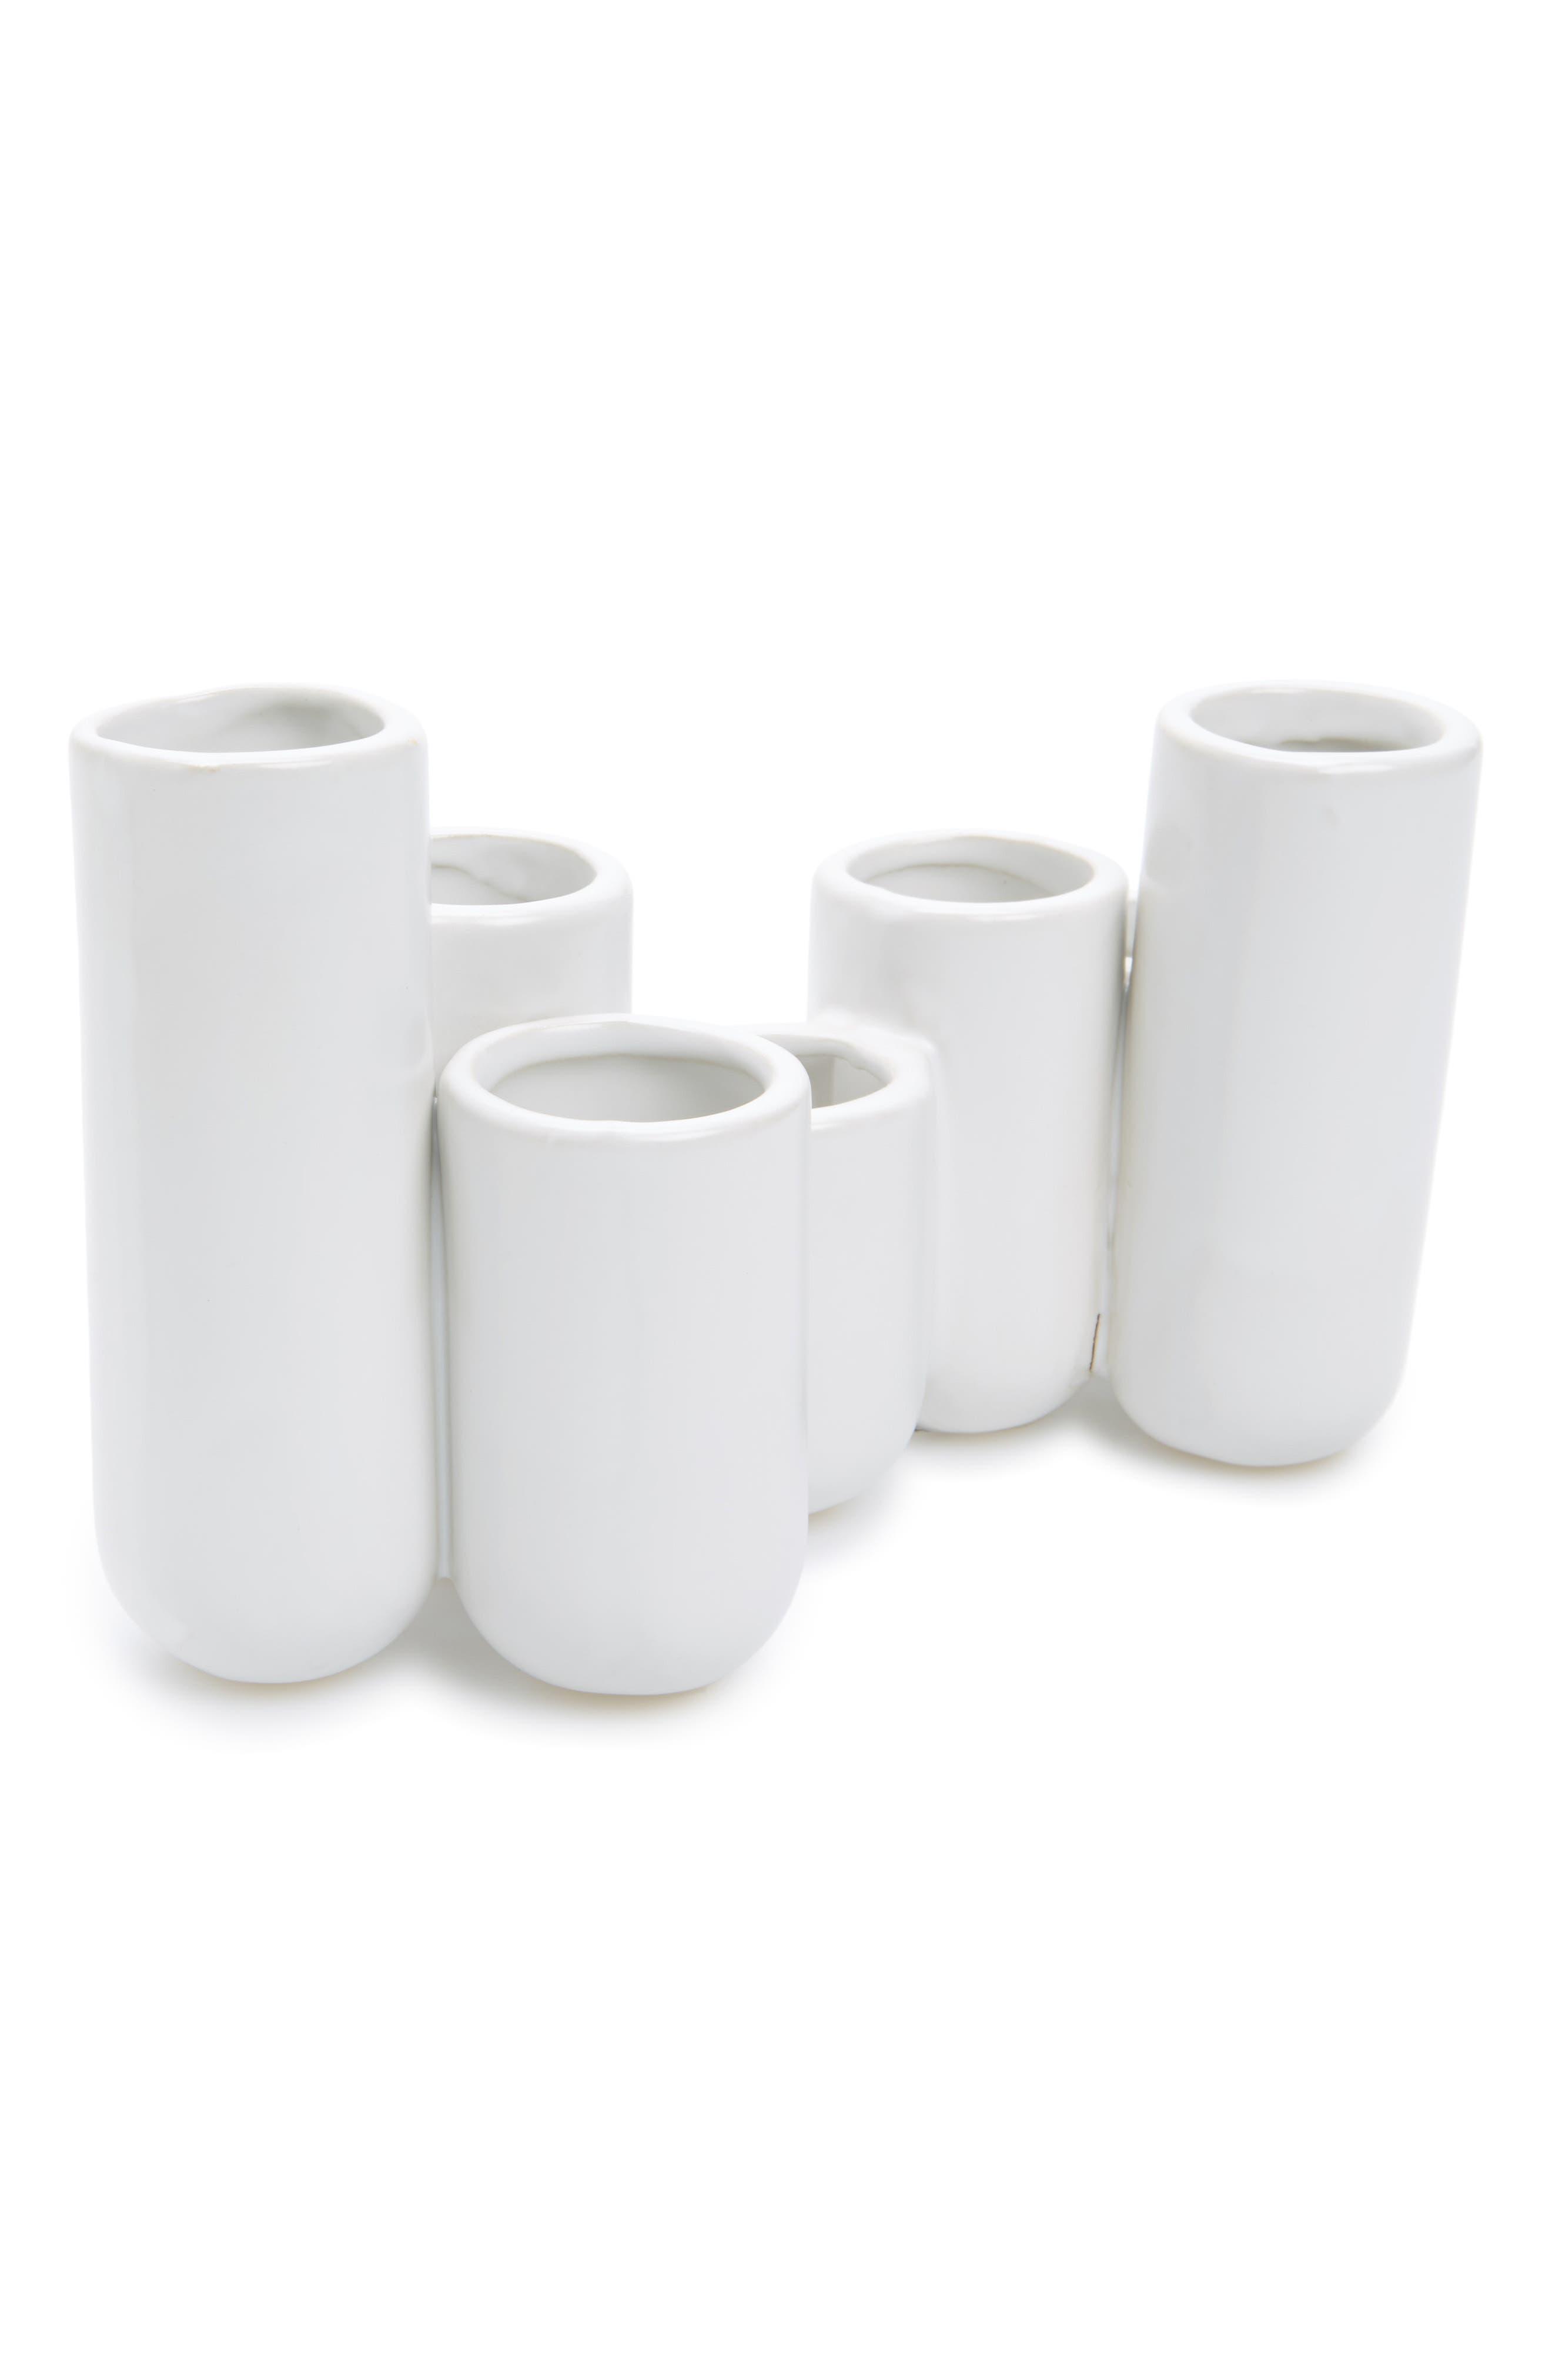 Alternate Image 1 Selected - HomArt Multi Container Ceramic Bud Vase